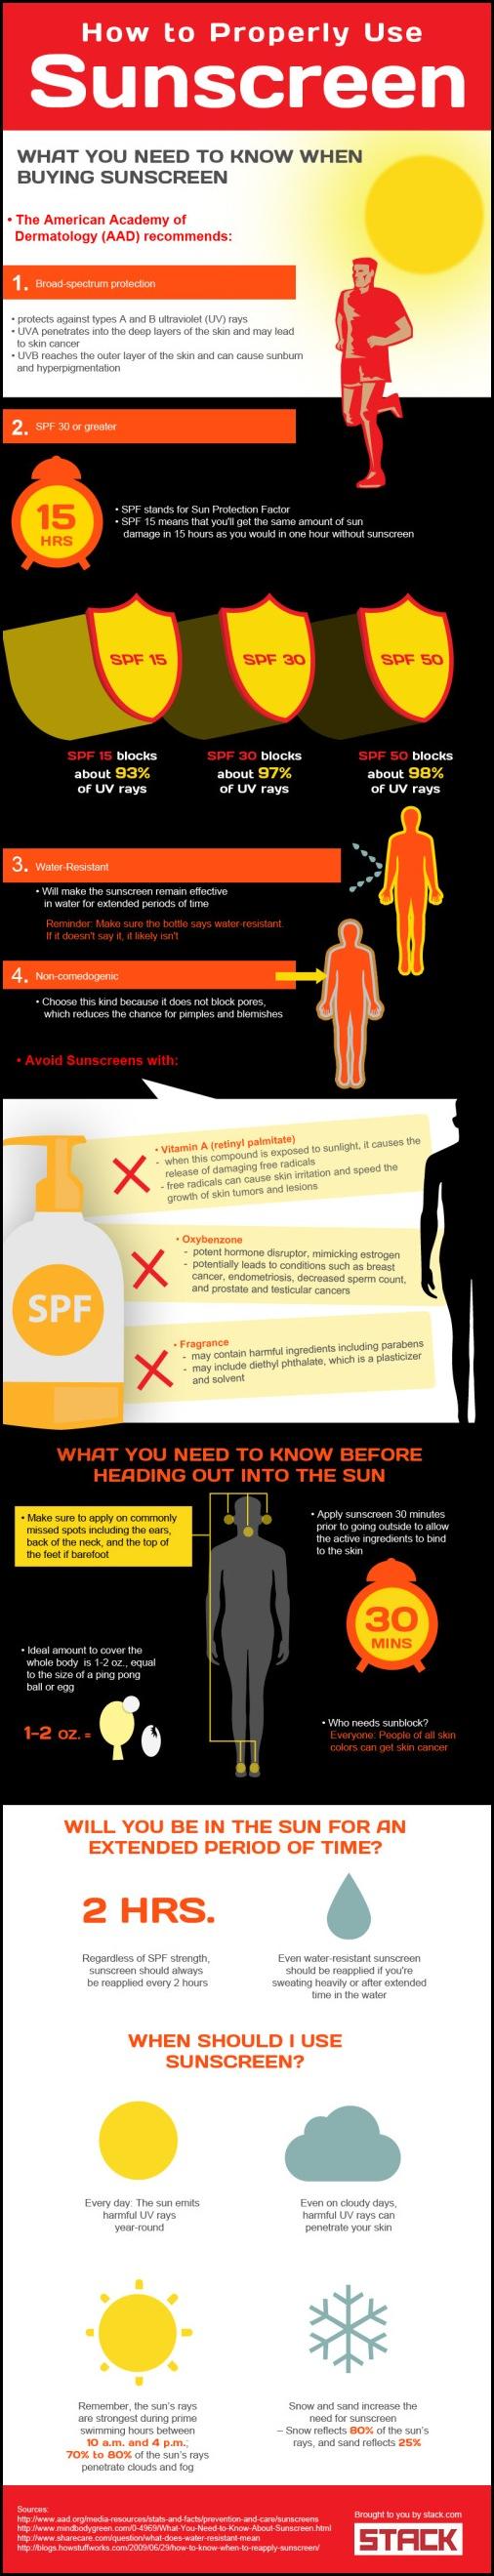 sunscreen_0620-1